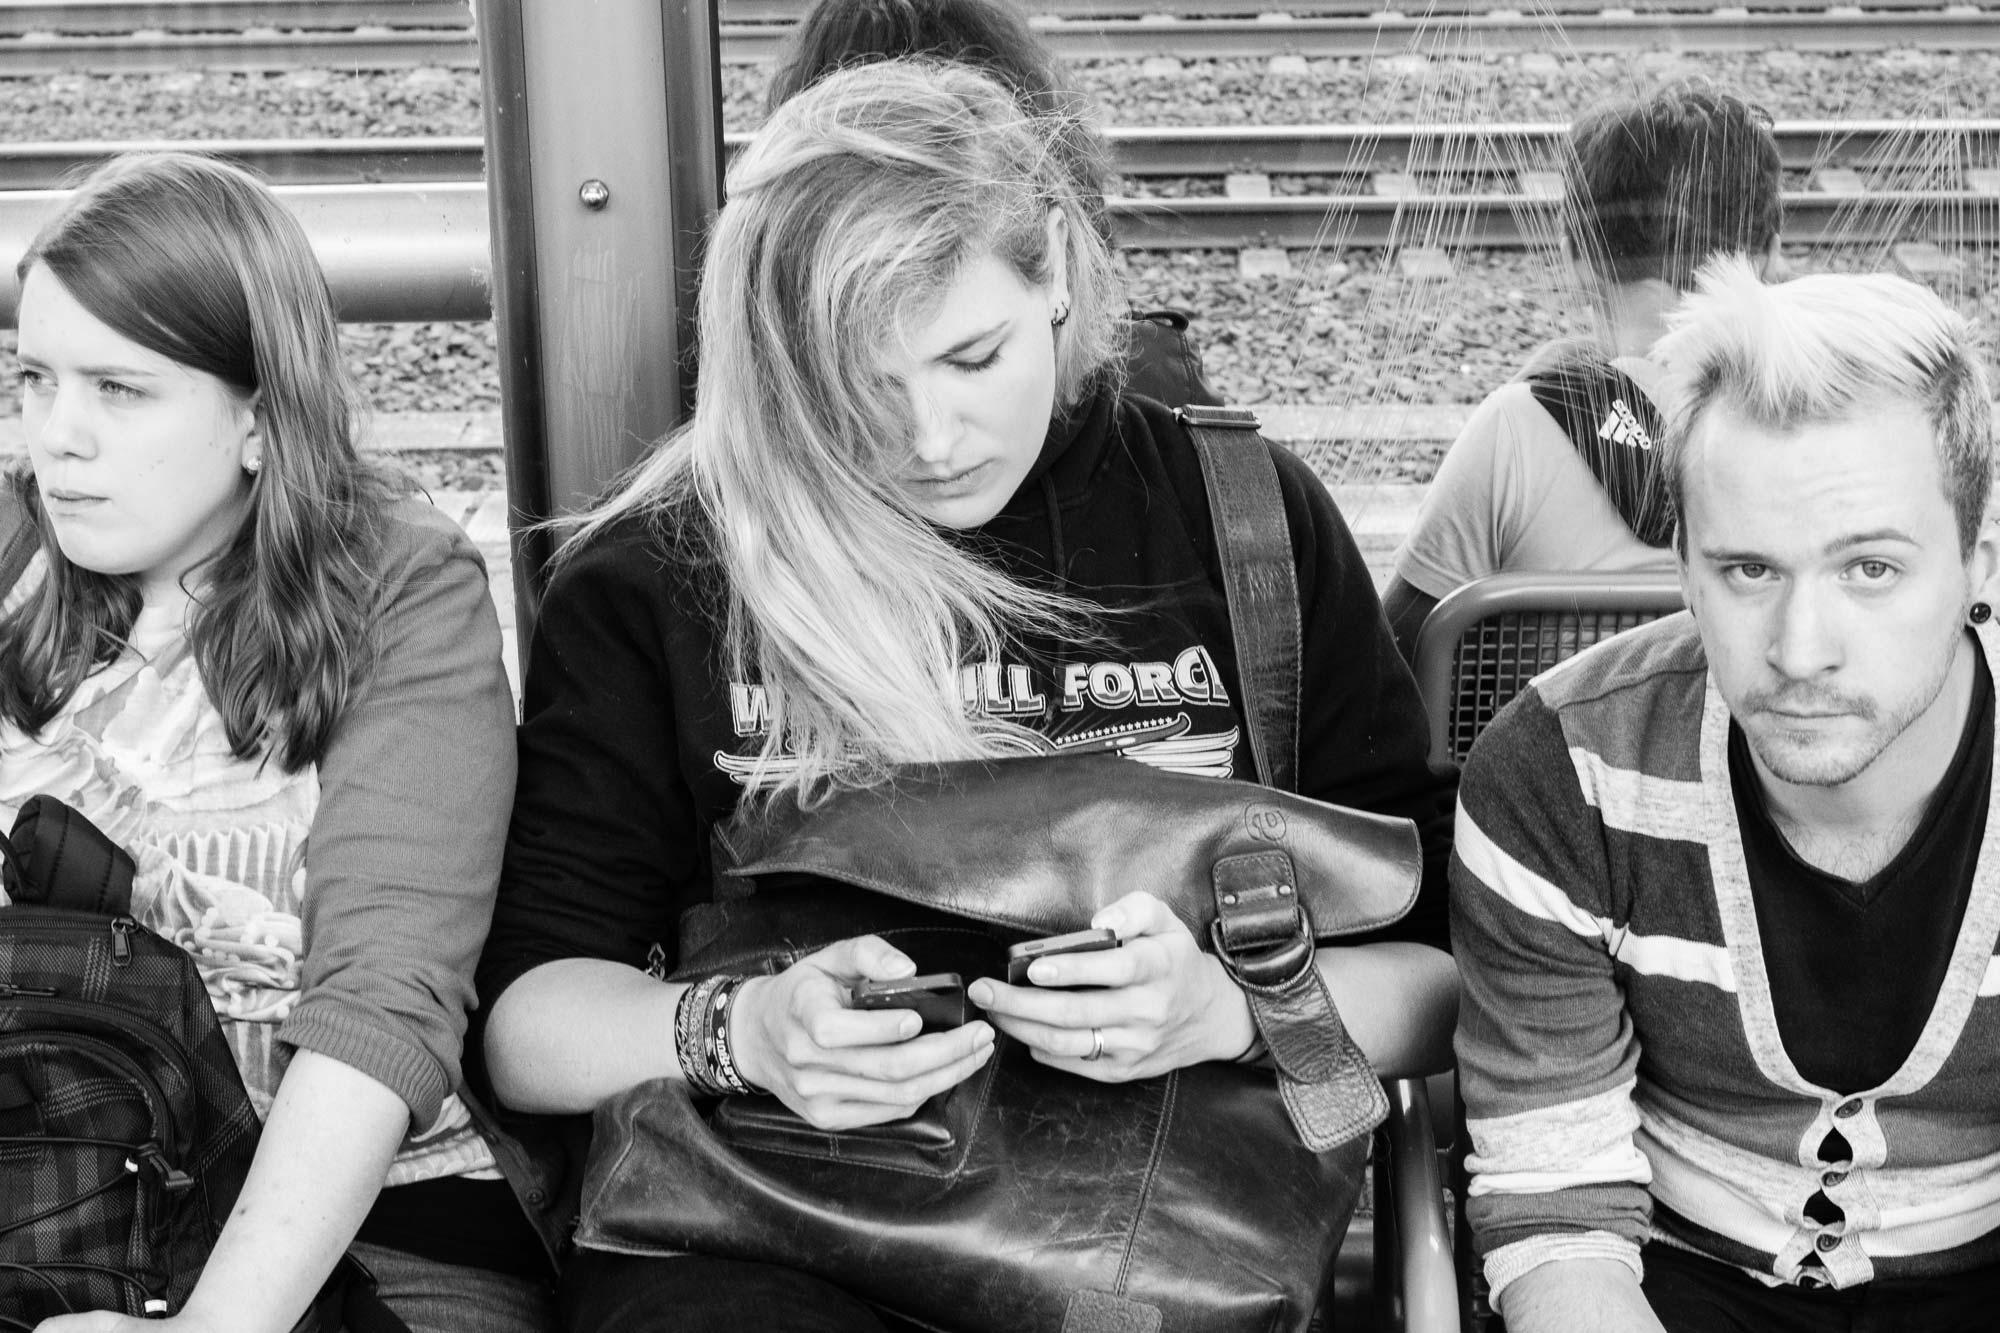 #BTK14 Handysucht